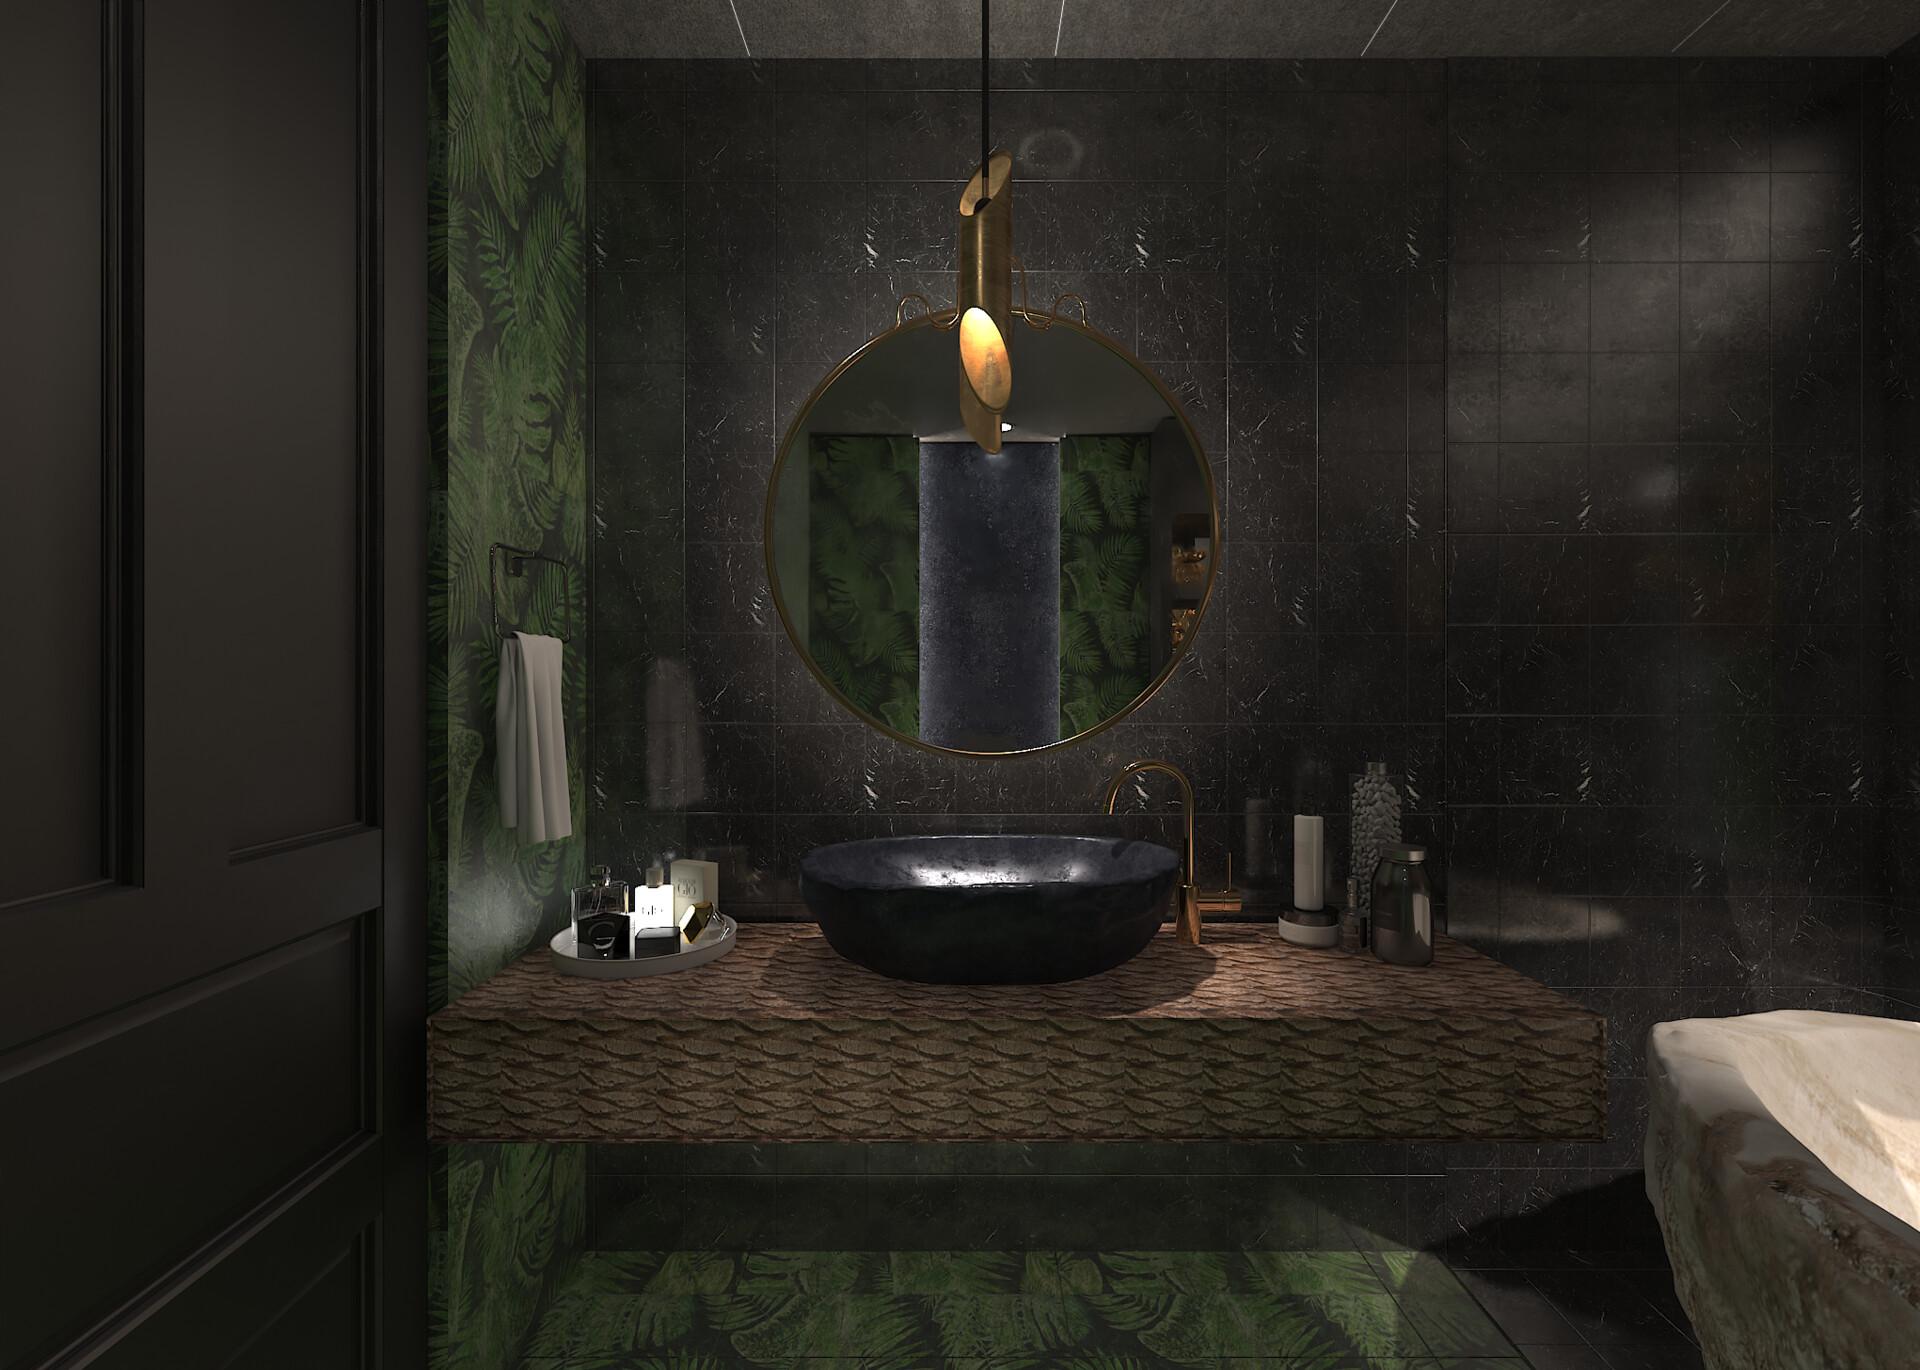 ArtStation - bathroom design palm, lasha jvaridze on dy design, l.a. design, setzer design, er design, color design, dj design, blue sky design, pi design, ns design, berserk design,